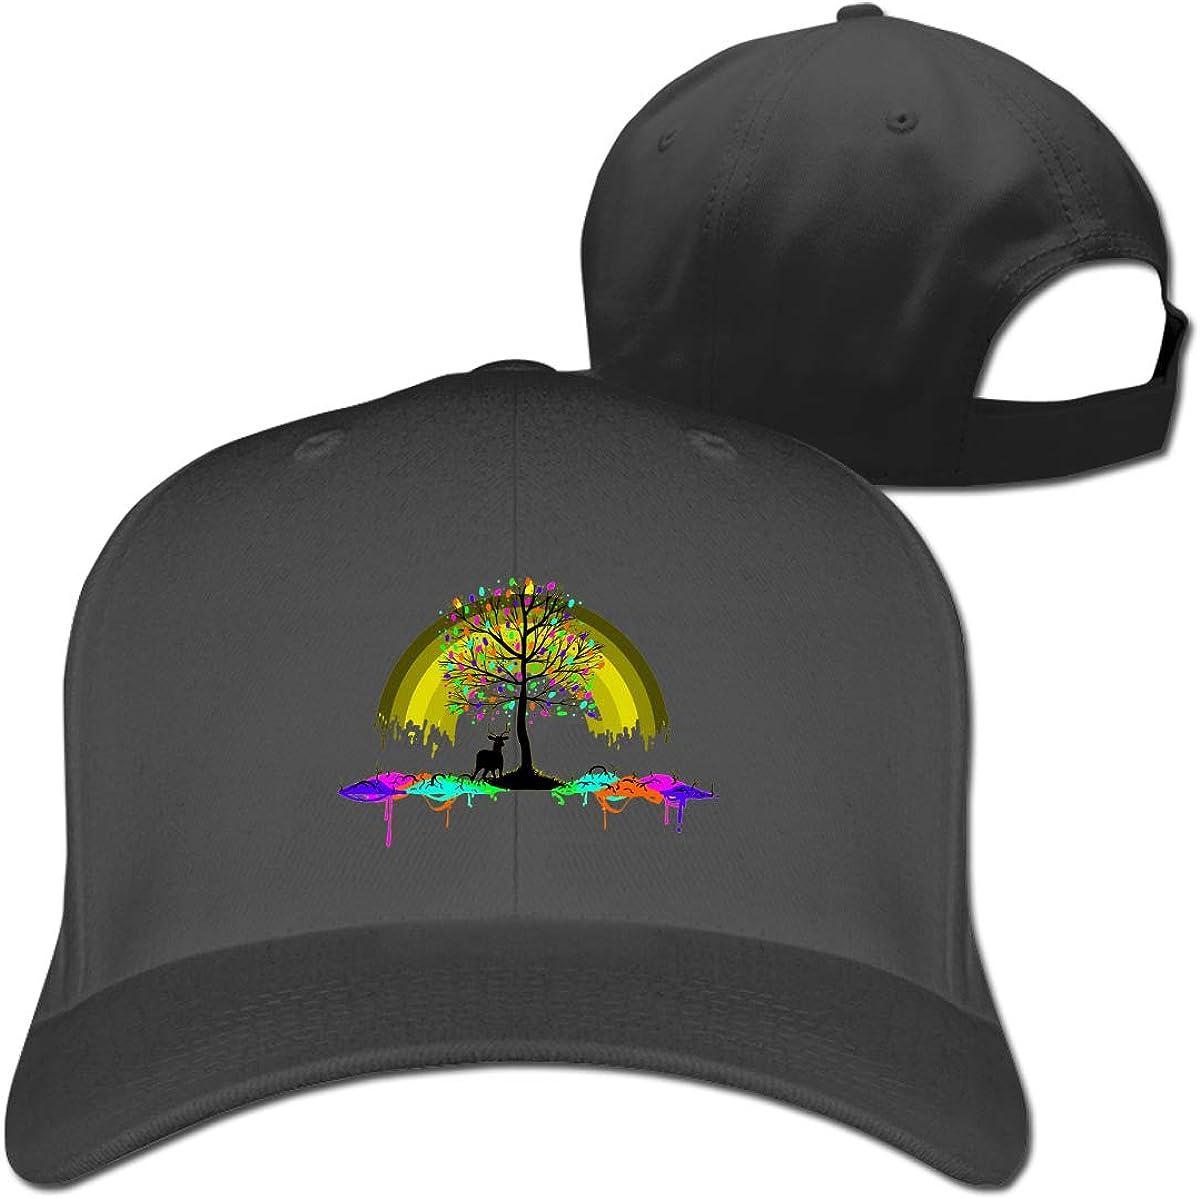 Rainbow Elk Fashion Adjustable Cotton Baseball Caps Trucker Driver Hat Outdoor Cap Black